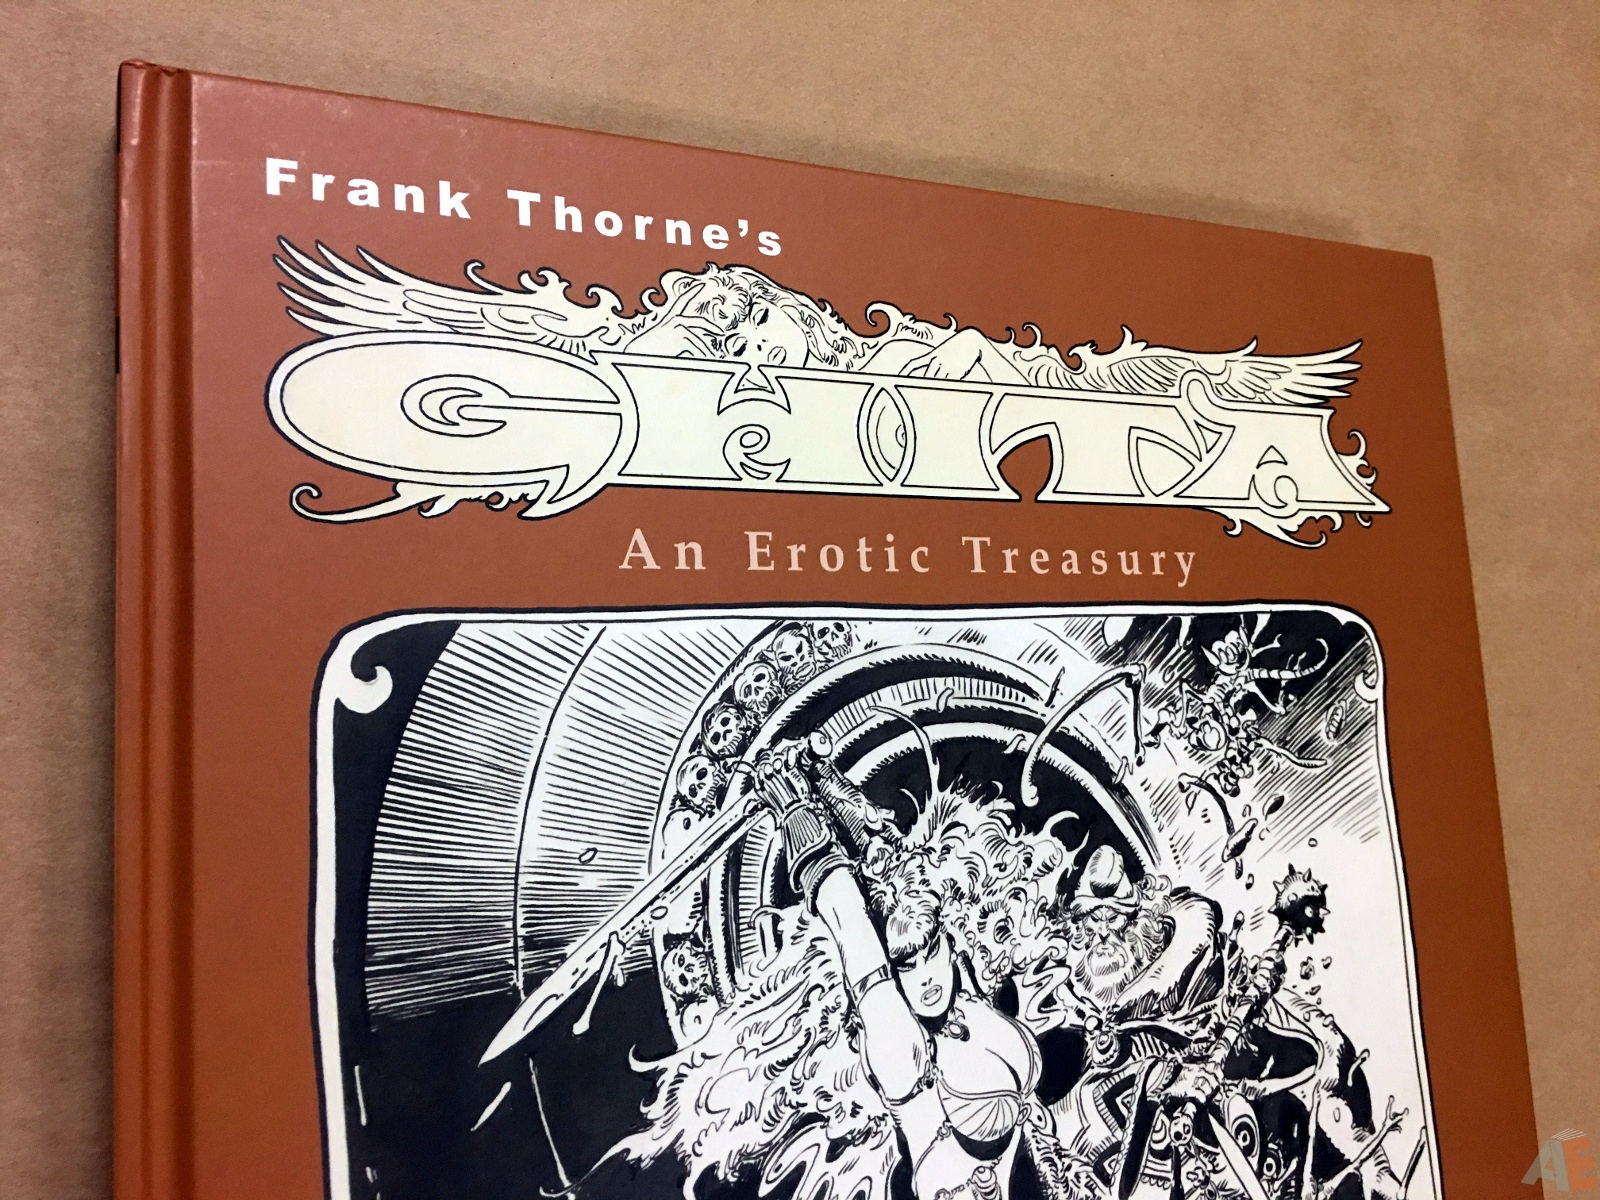 Frank Thorne's Ghita An Erotic Treasury Archival Edition Volume 1 48